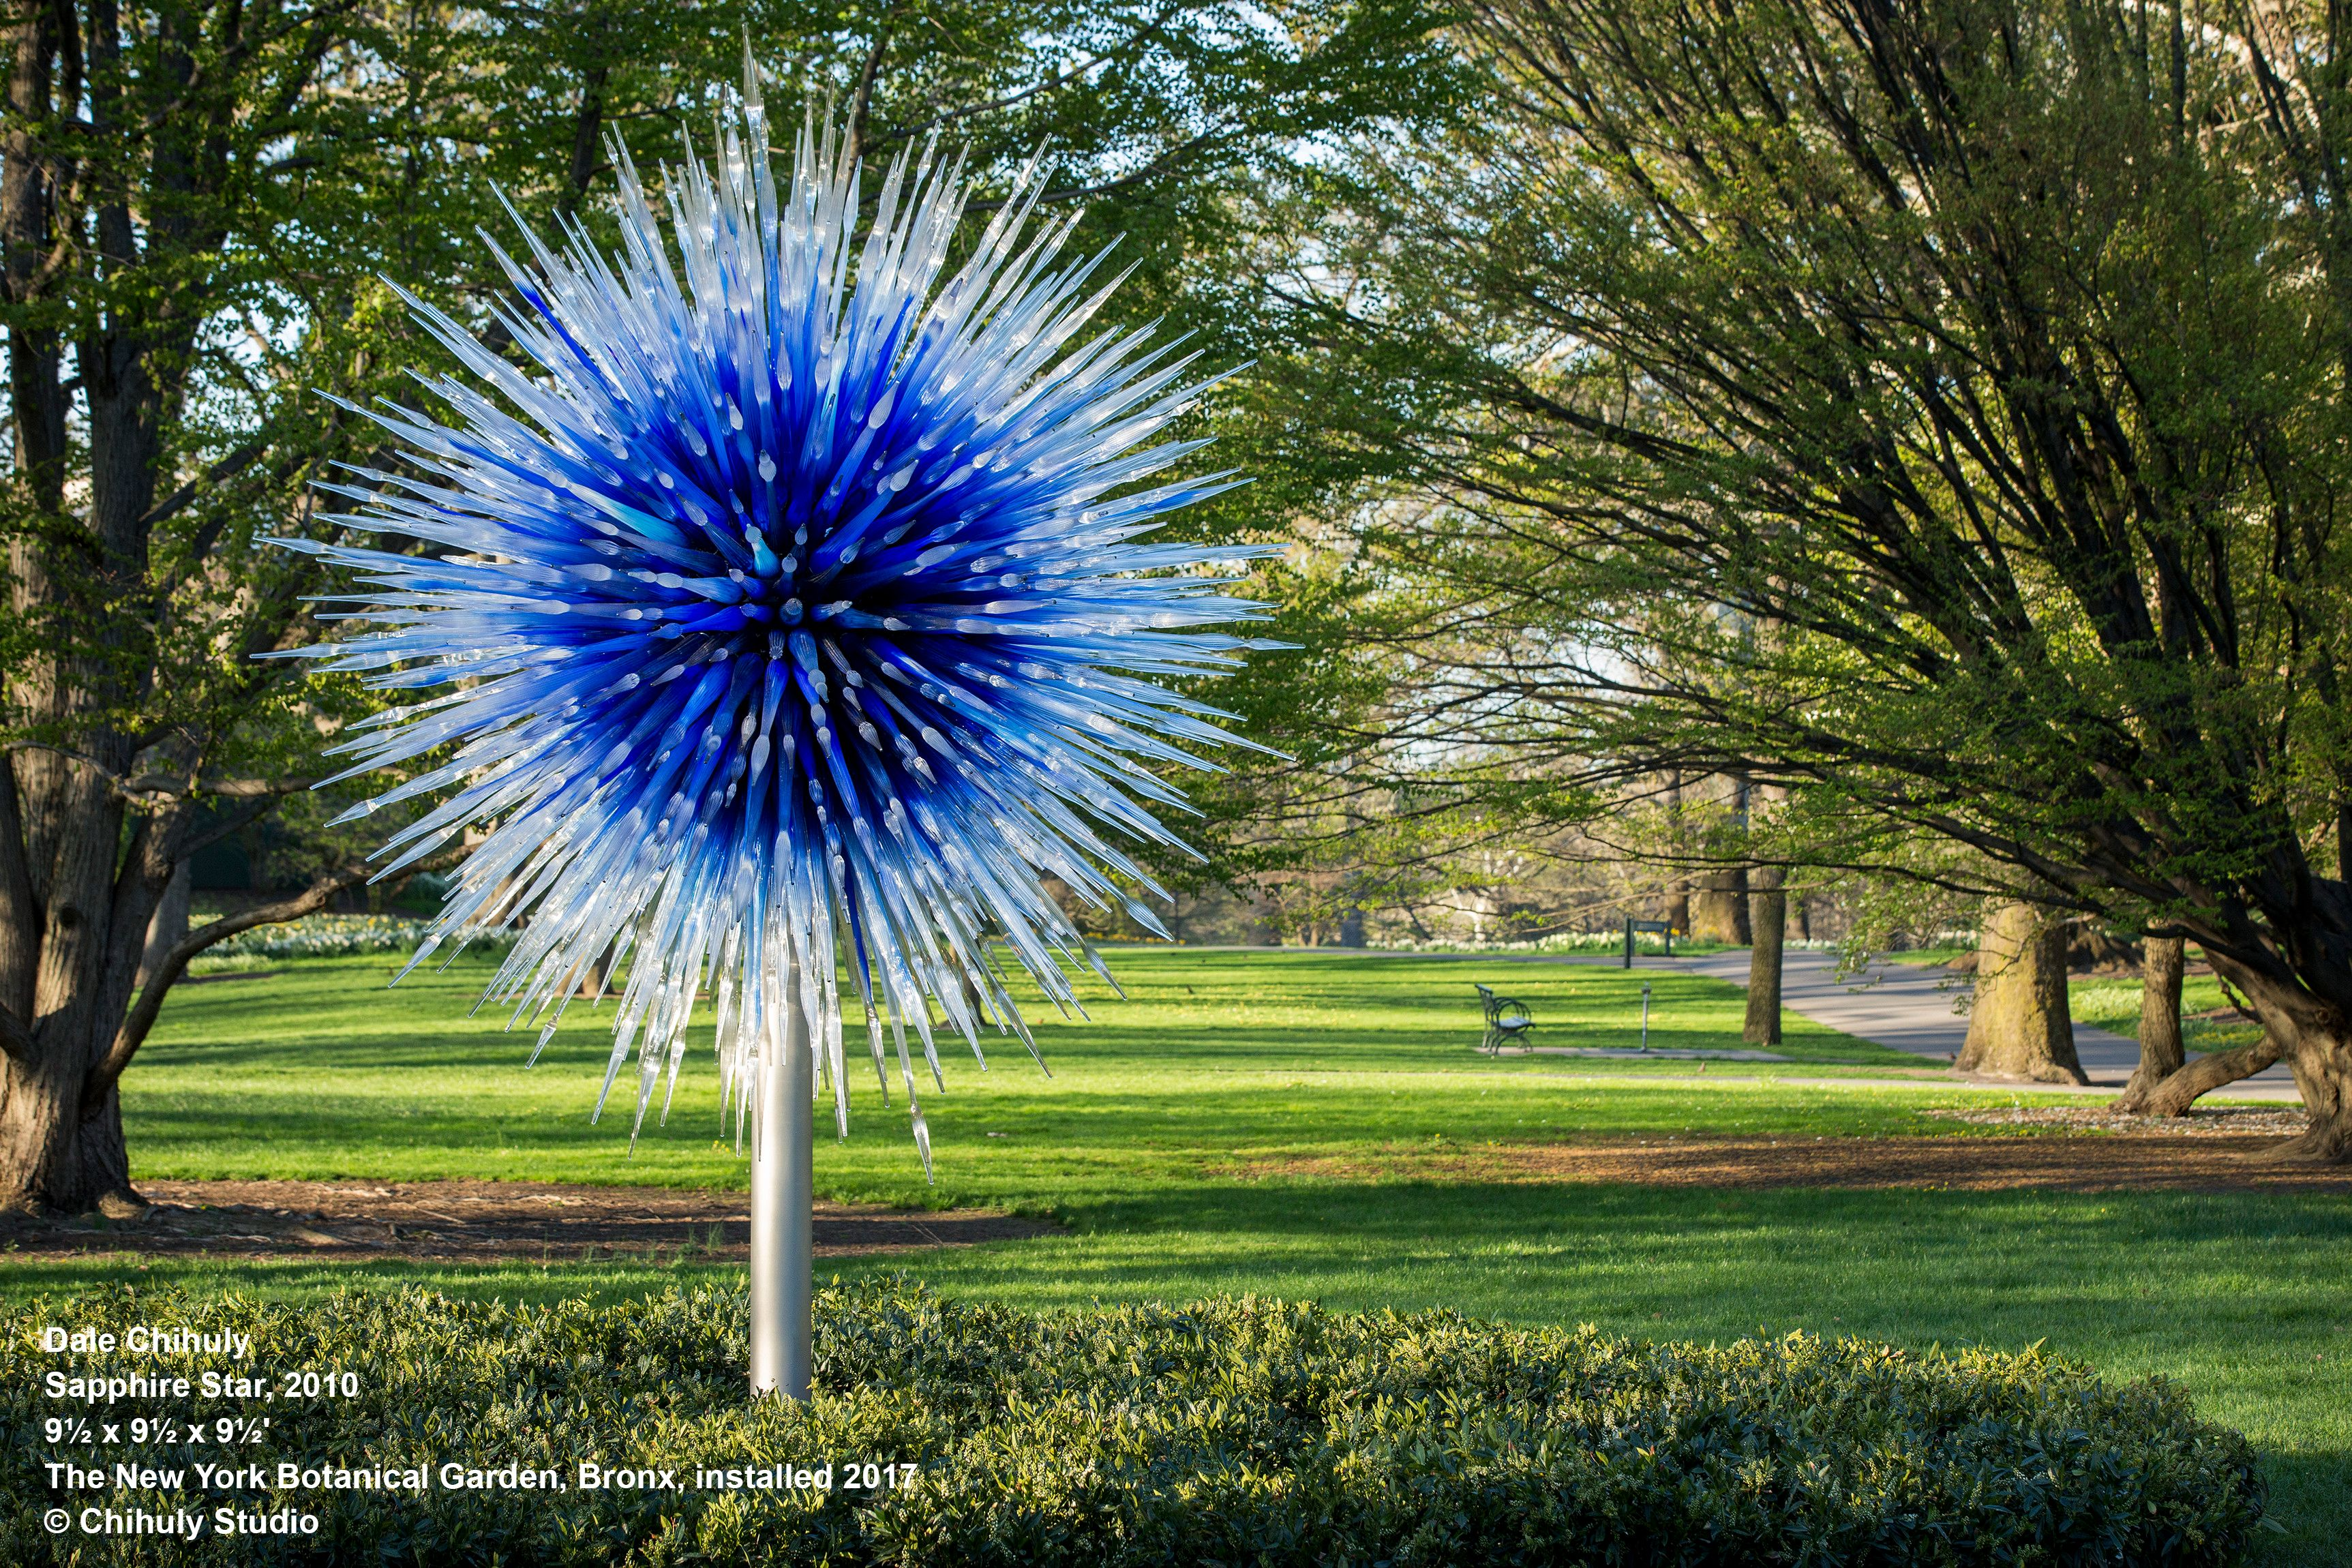 9bfb825f596523b4548e1a1968e1bac5 - Dale Chihuly St Louis Botanical Gardens